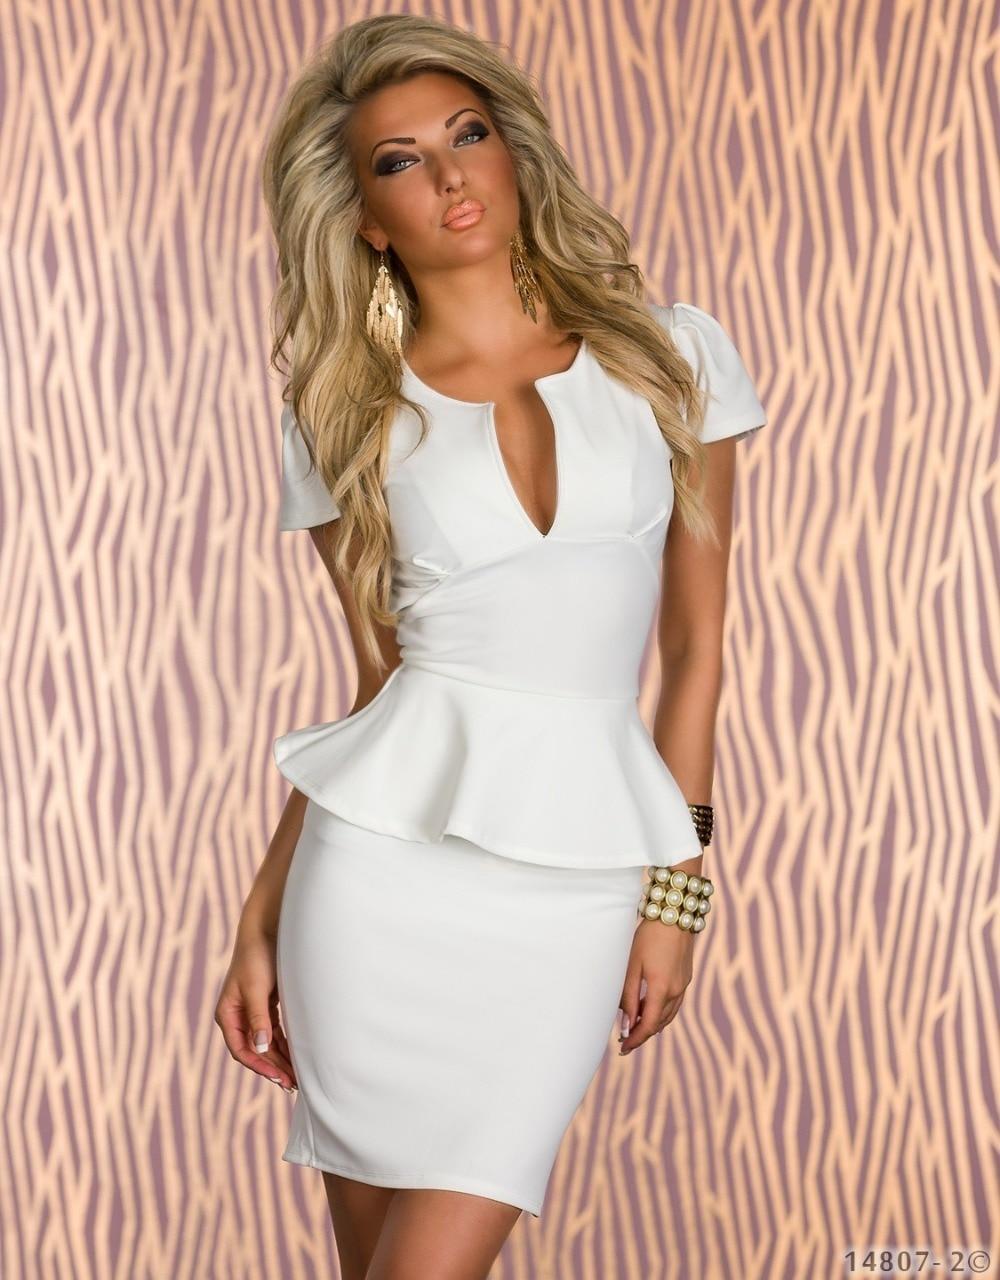 ML17883 Short Sleeve Women Bandage Bodycon Dress Office Lady OL Work Wear  Dress White Blue Rose Black Peplum Mini Dress 010a55e82c4f